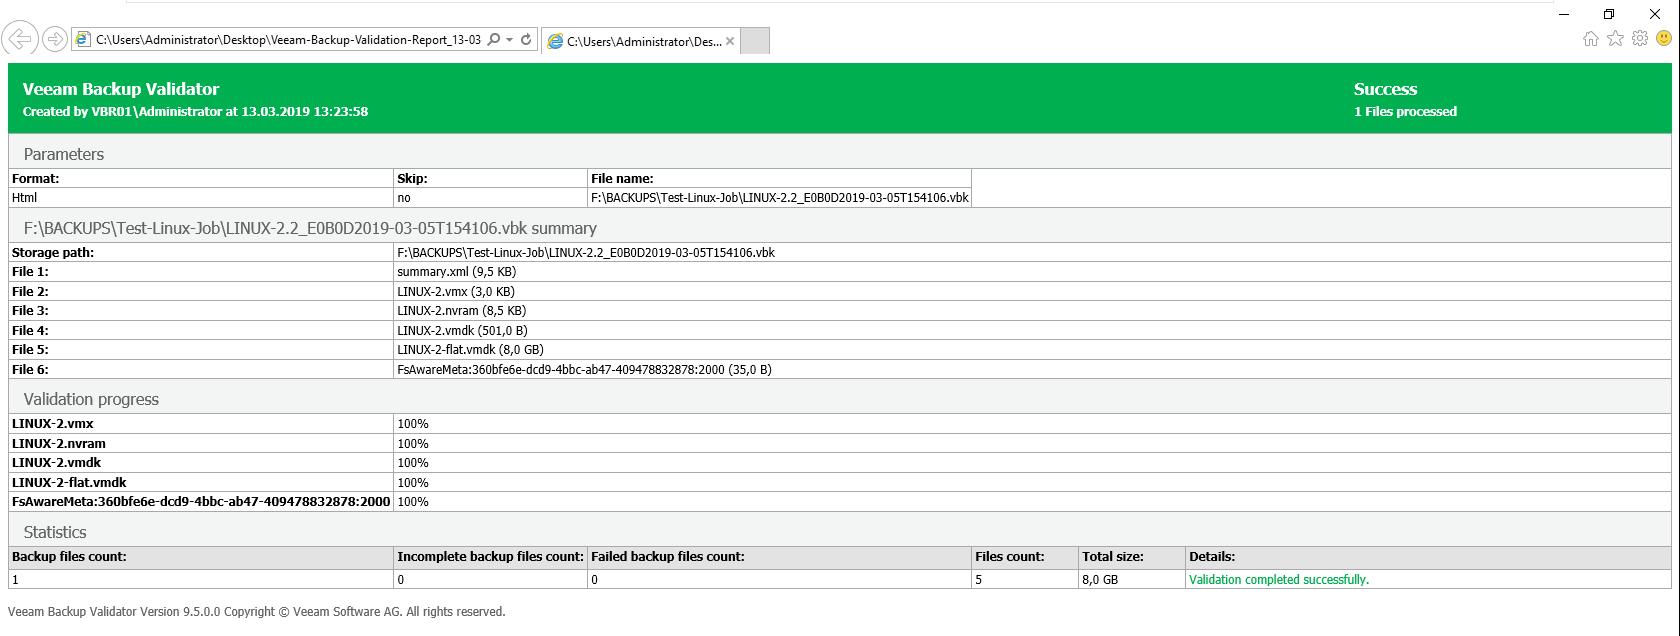 Veeam Backup Validator PowerShell GUI - virtualhome blog